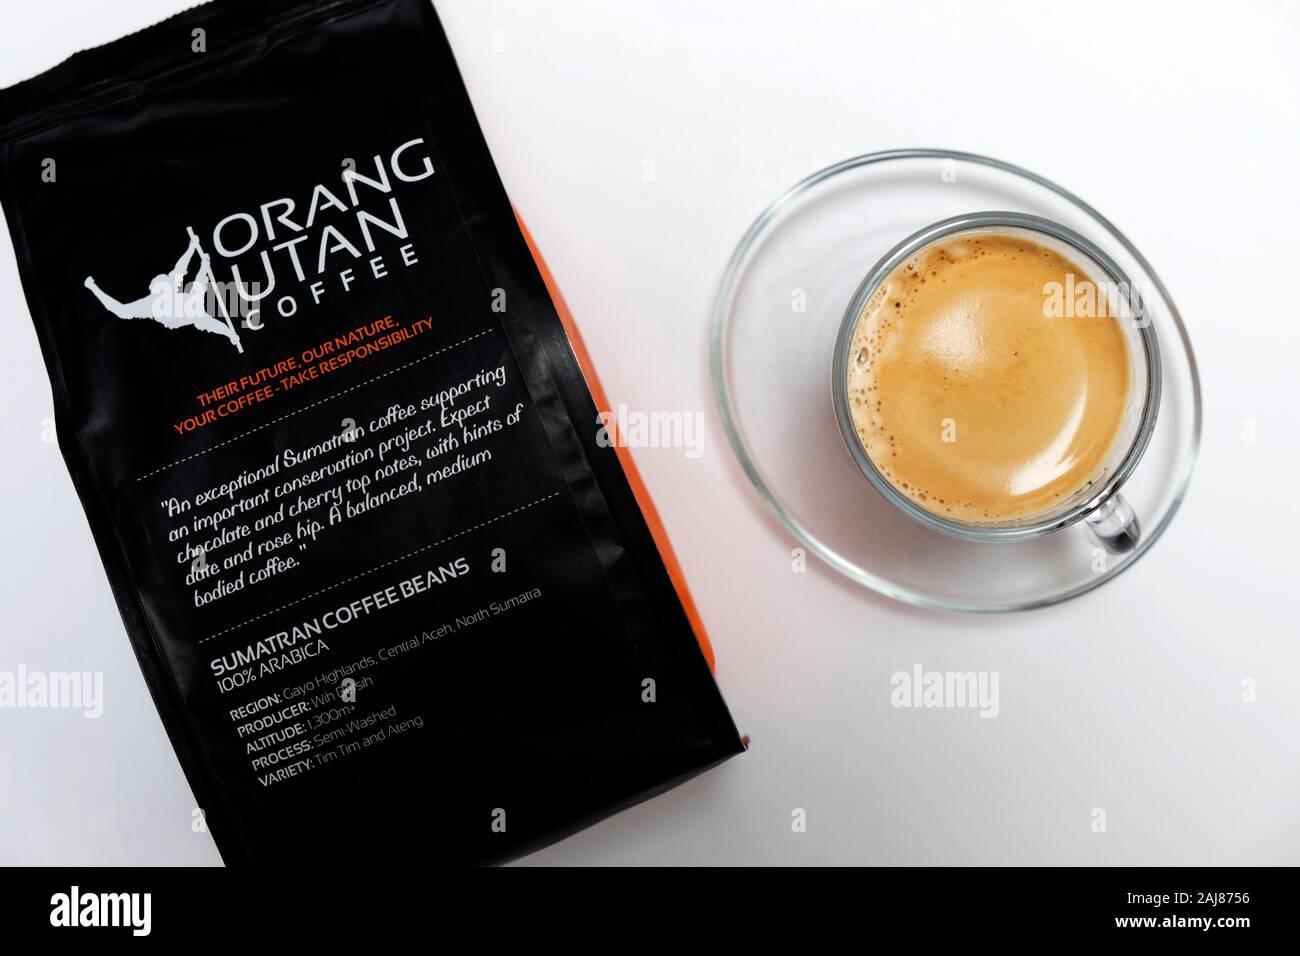 Orang Utan coffee Stock Photo